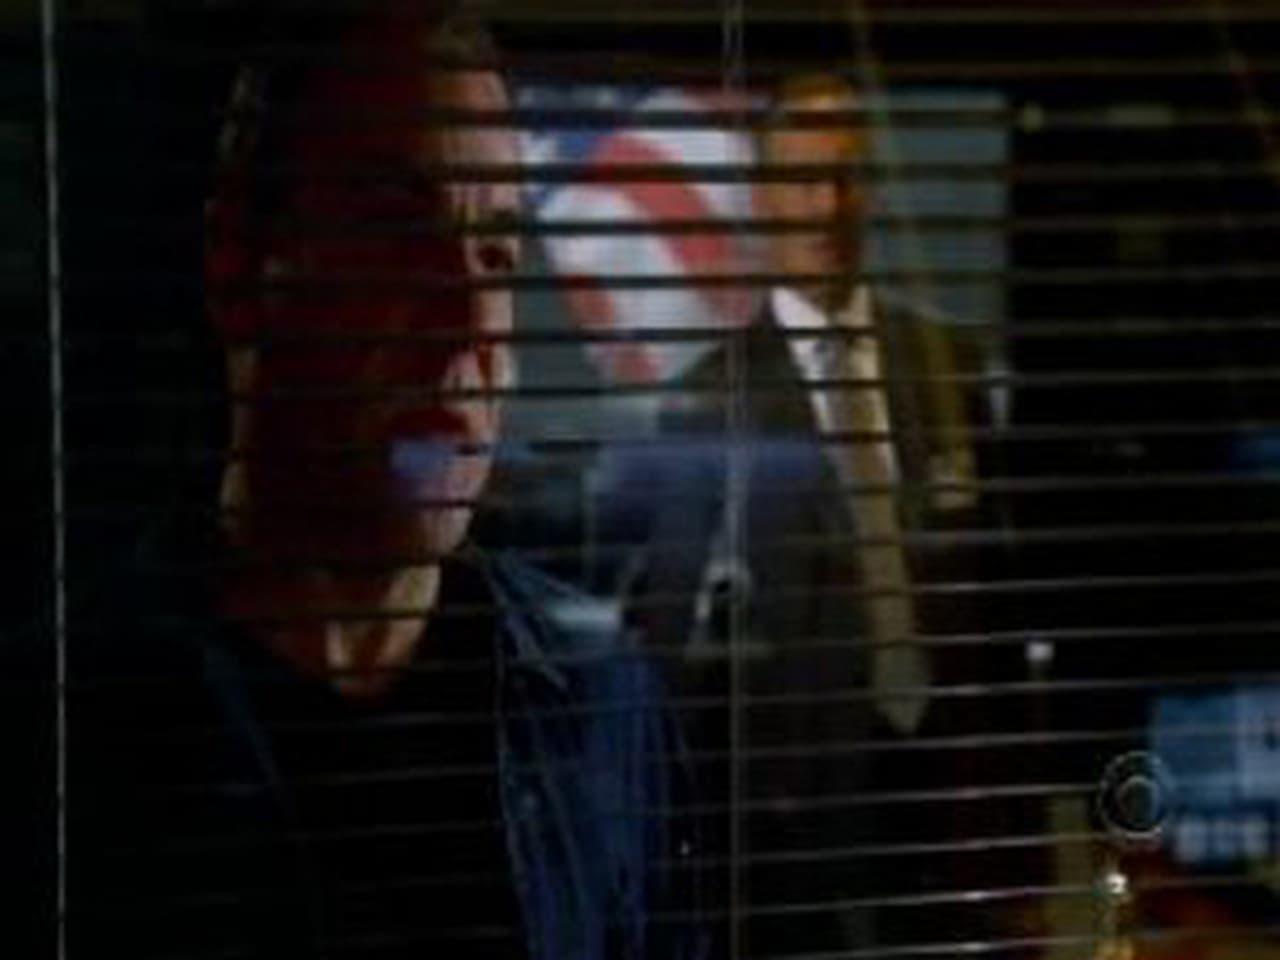 Criminal Minds - Season 1 Episode 21 : Secrets and Lies